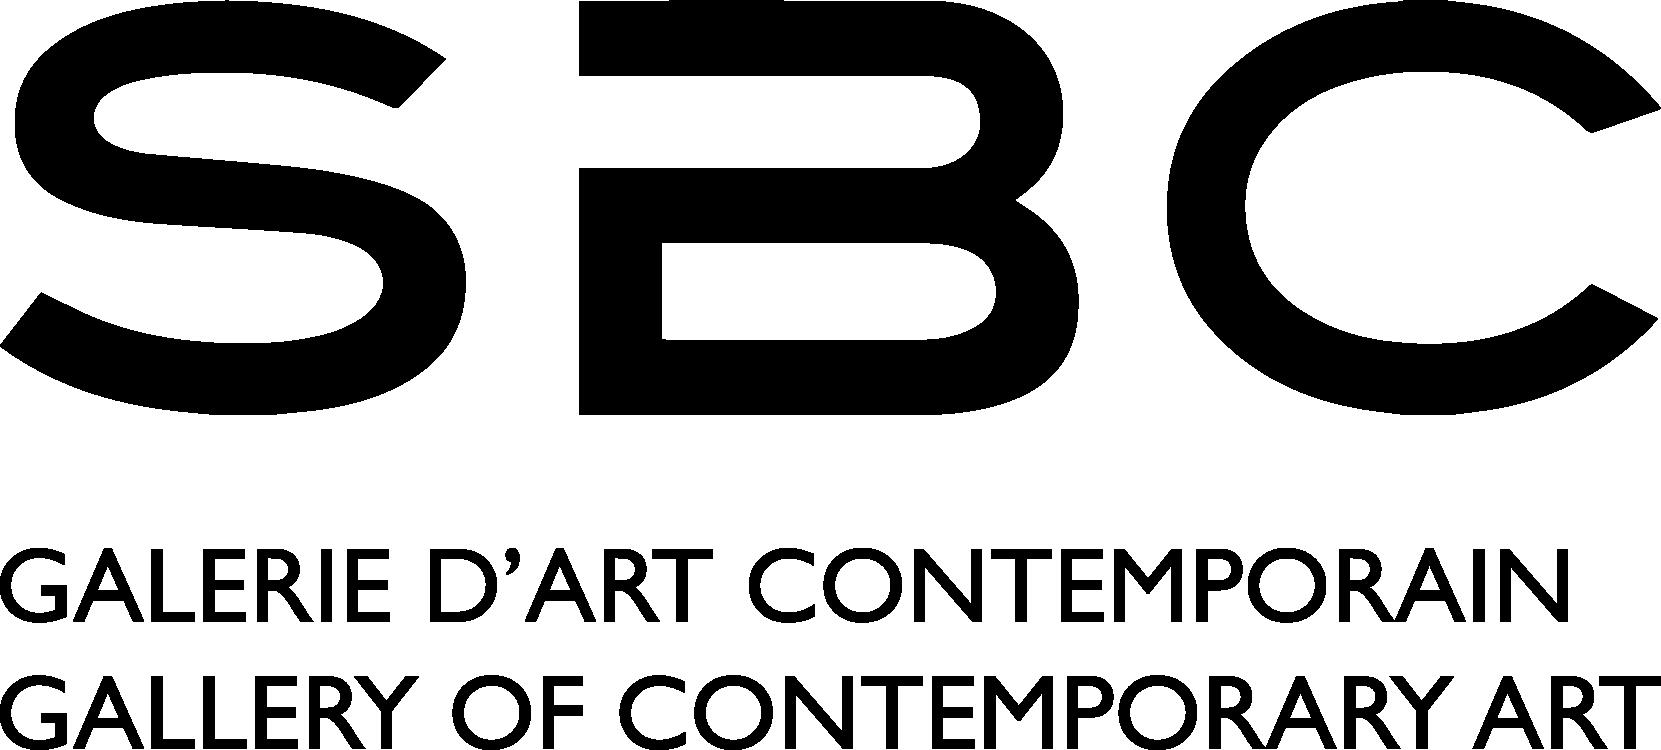 Logo for SBC